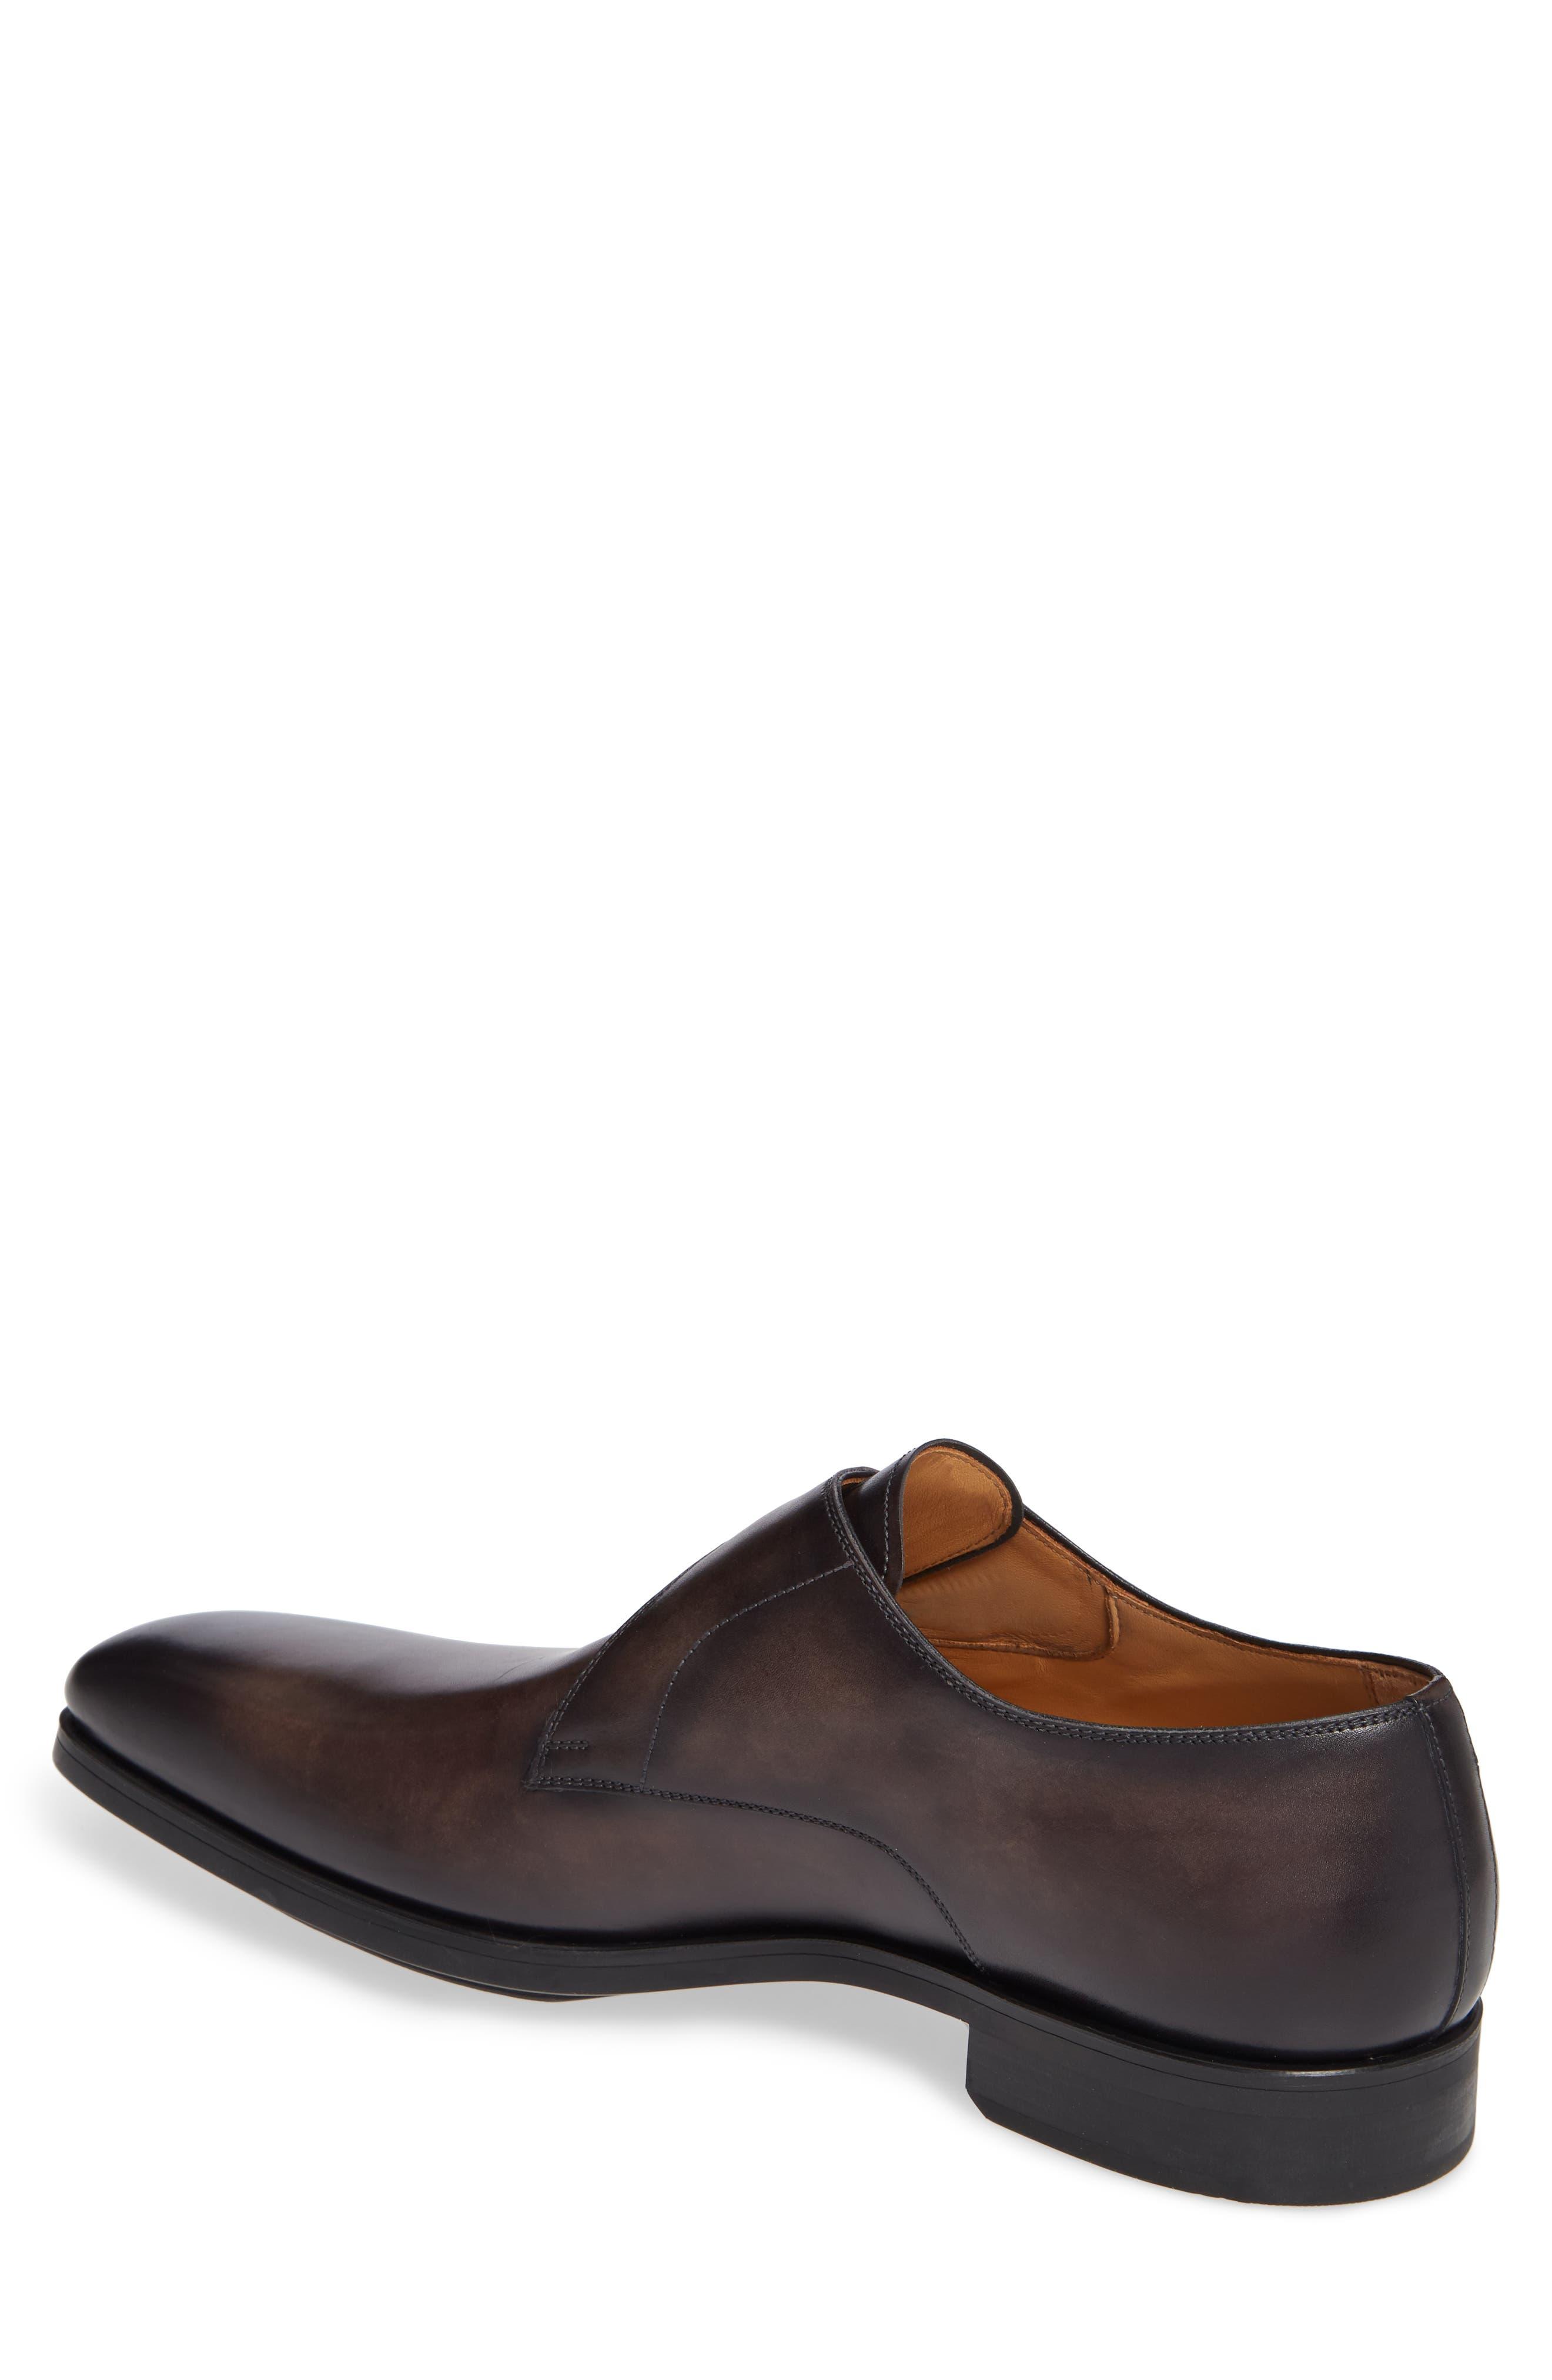 MAGNANNI, Roddy Diversa Plain Toe Monk Strap Shoe, Alternate thumbnail 2, color, GREY LEATHER